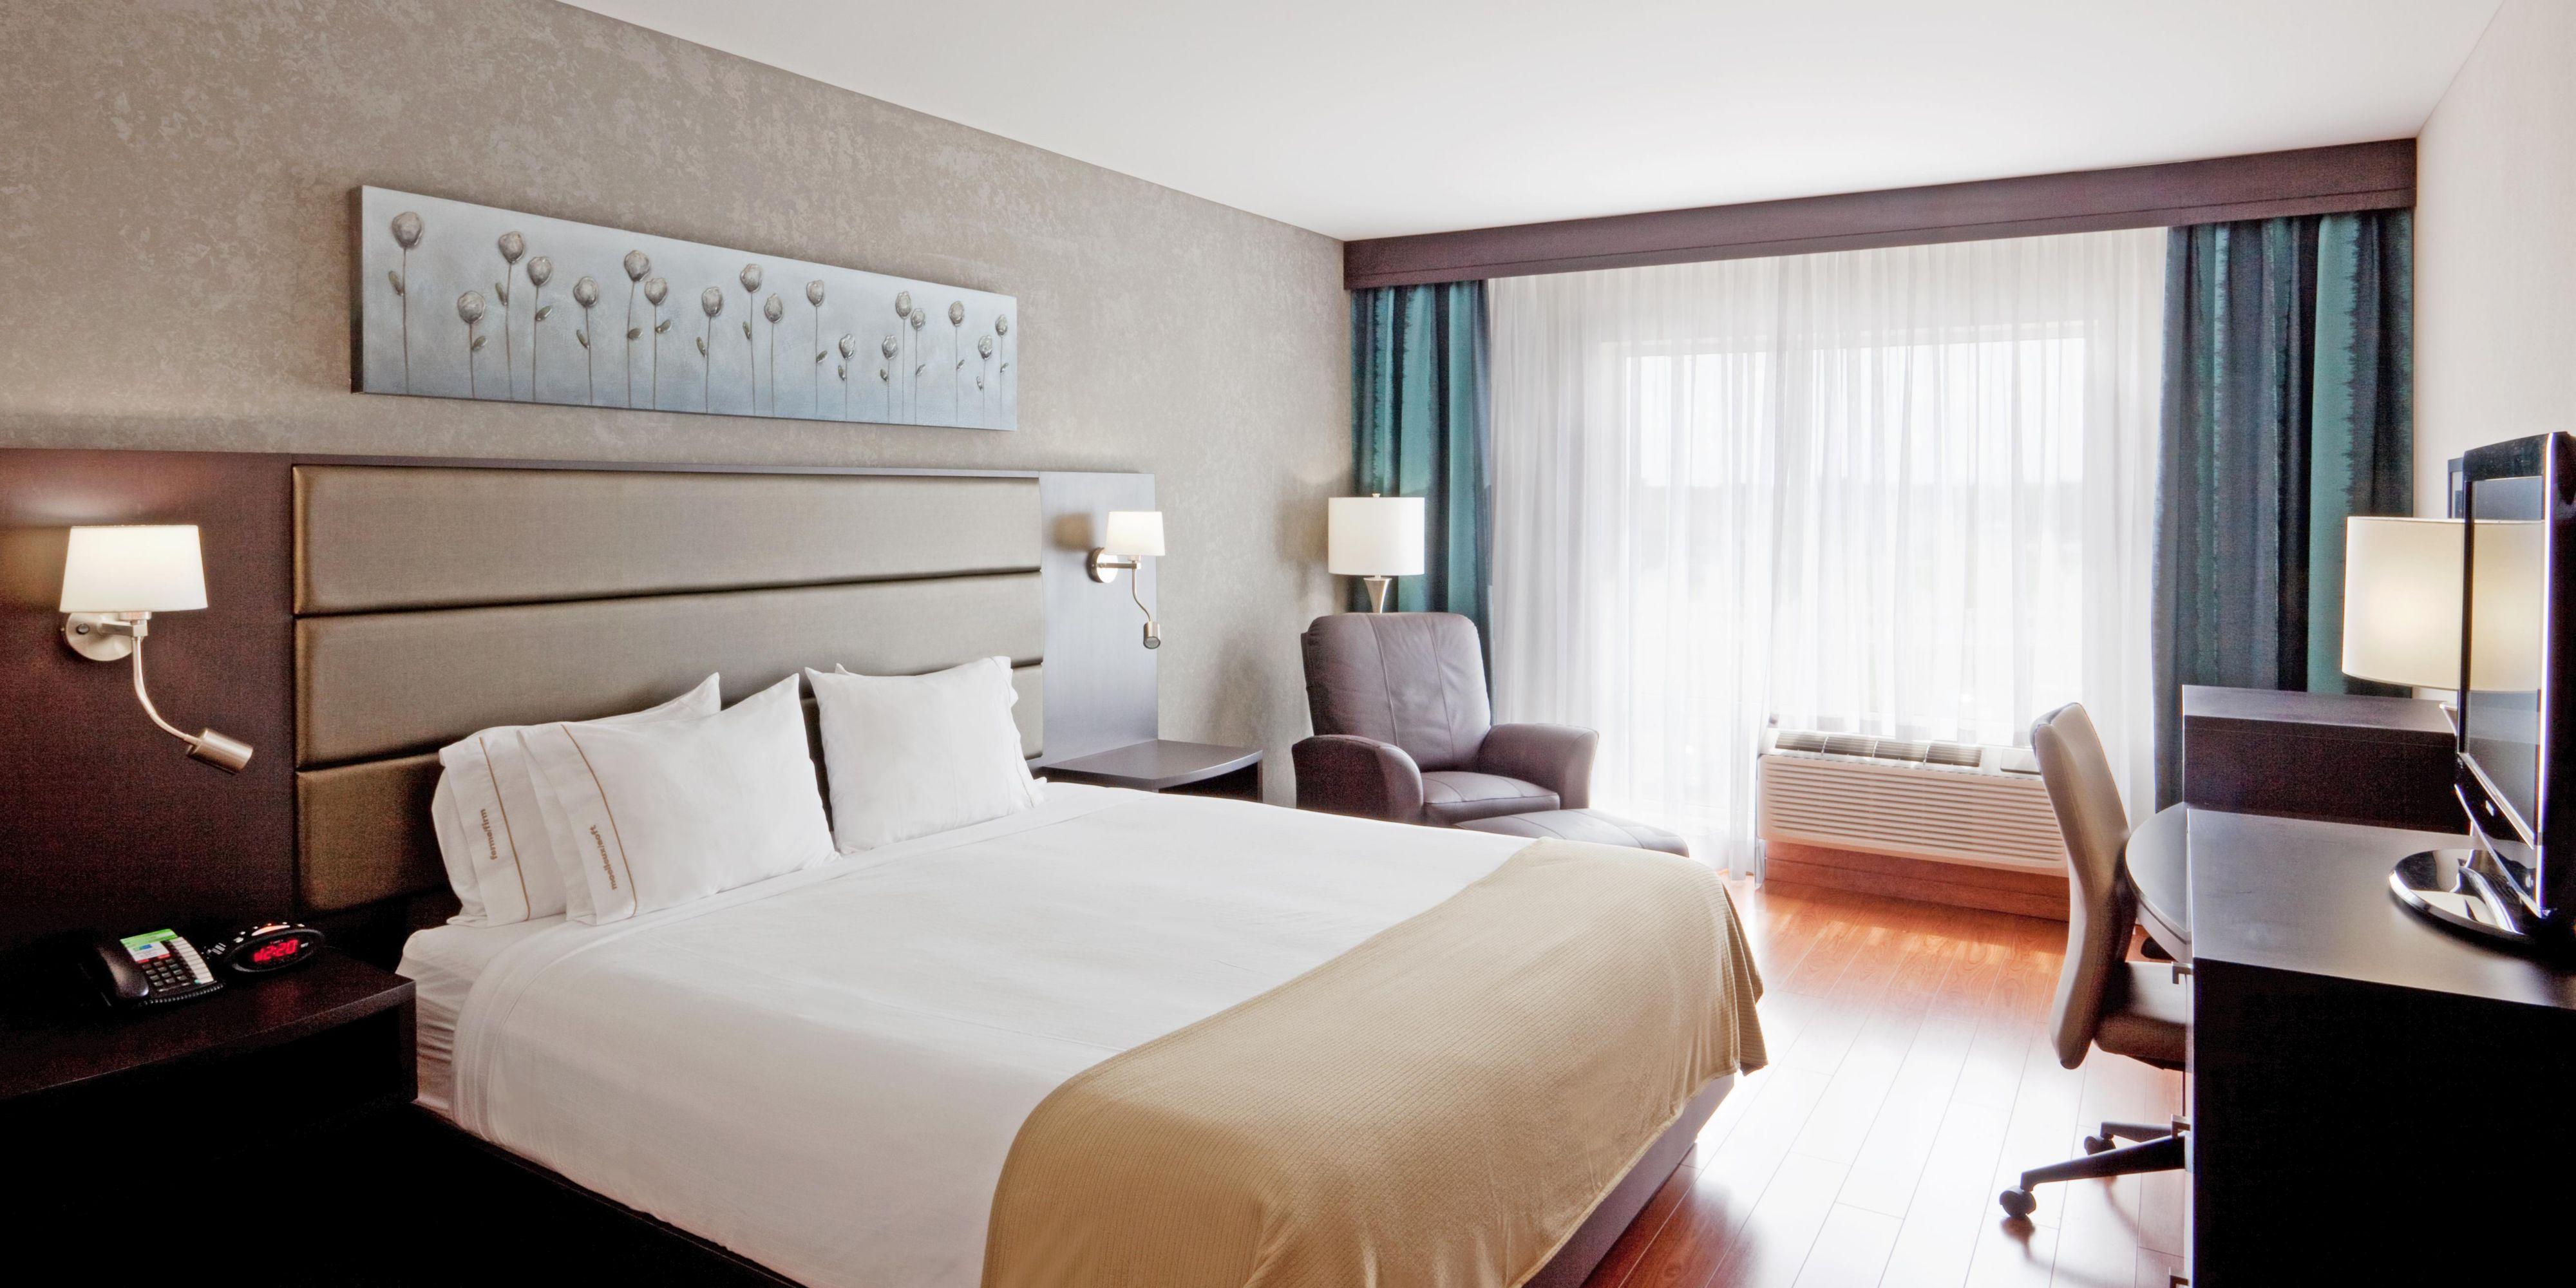 Holiday Inn Express & Suites Saint Hyacinthe Hotel by IHG